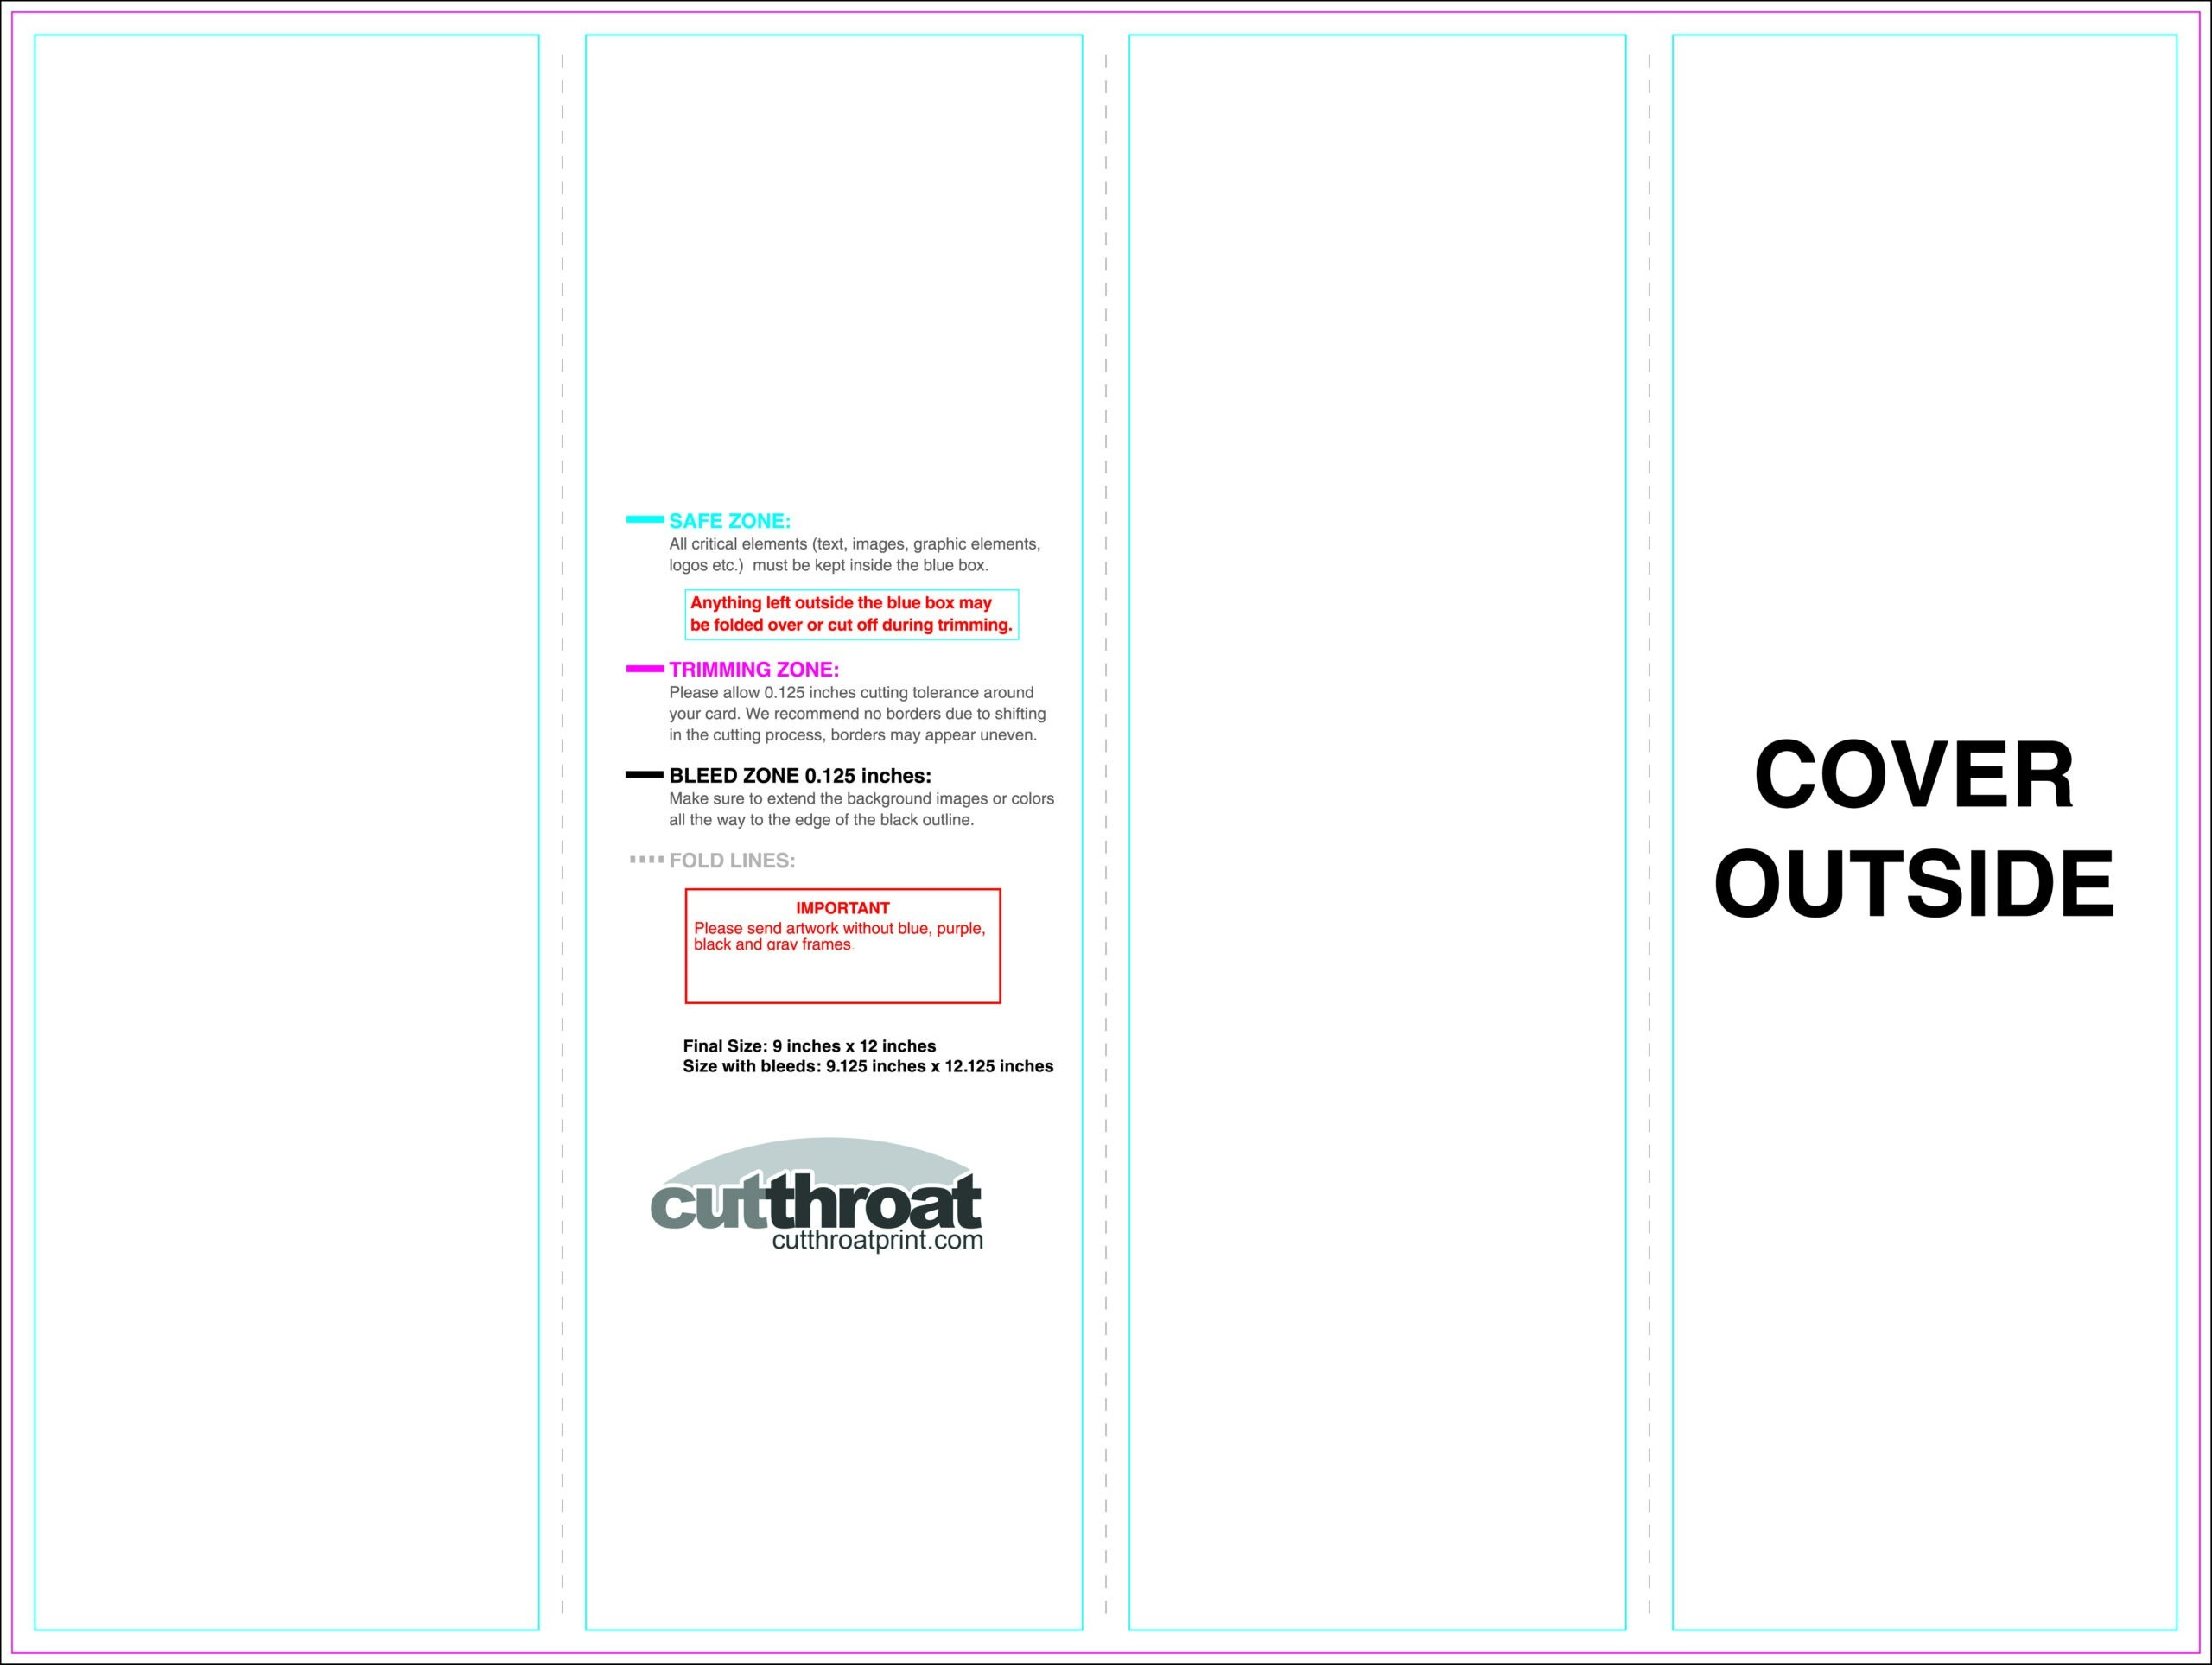 Cutthroat Printcustom Brochure Printing With 11X17 Brochure in 11X17 Brochure Template